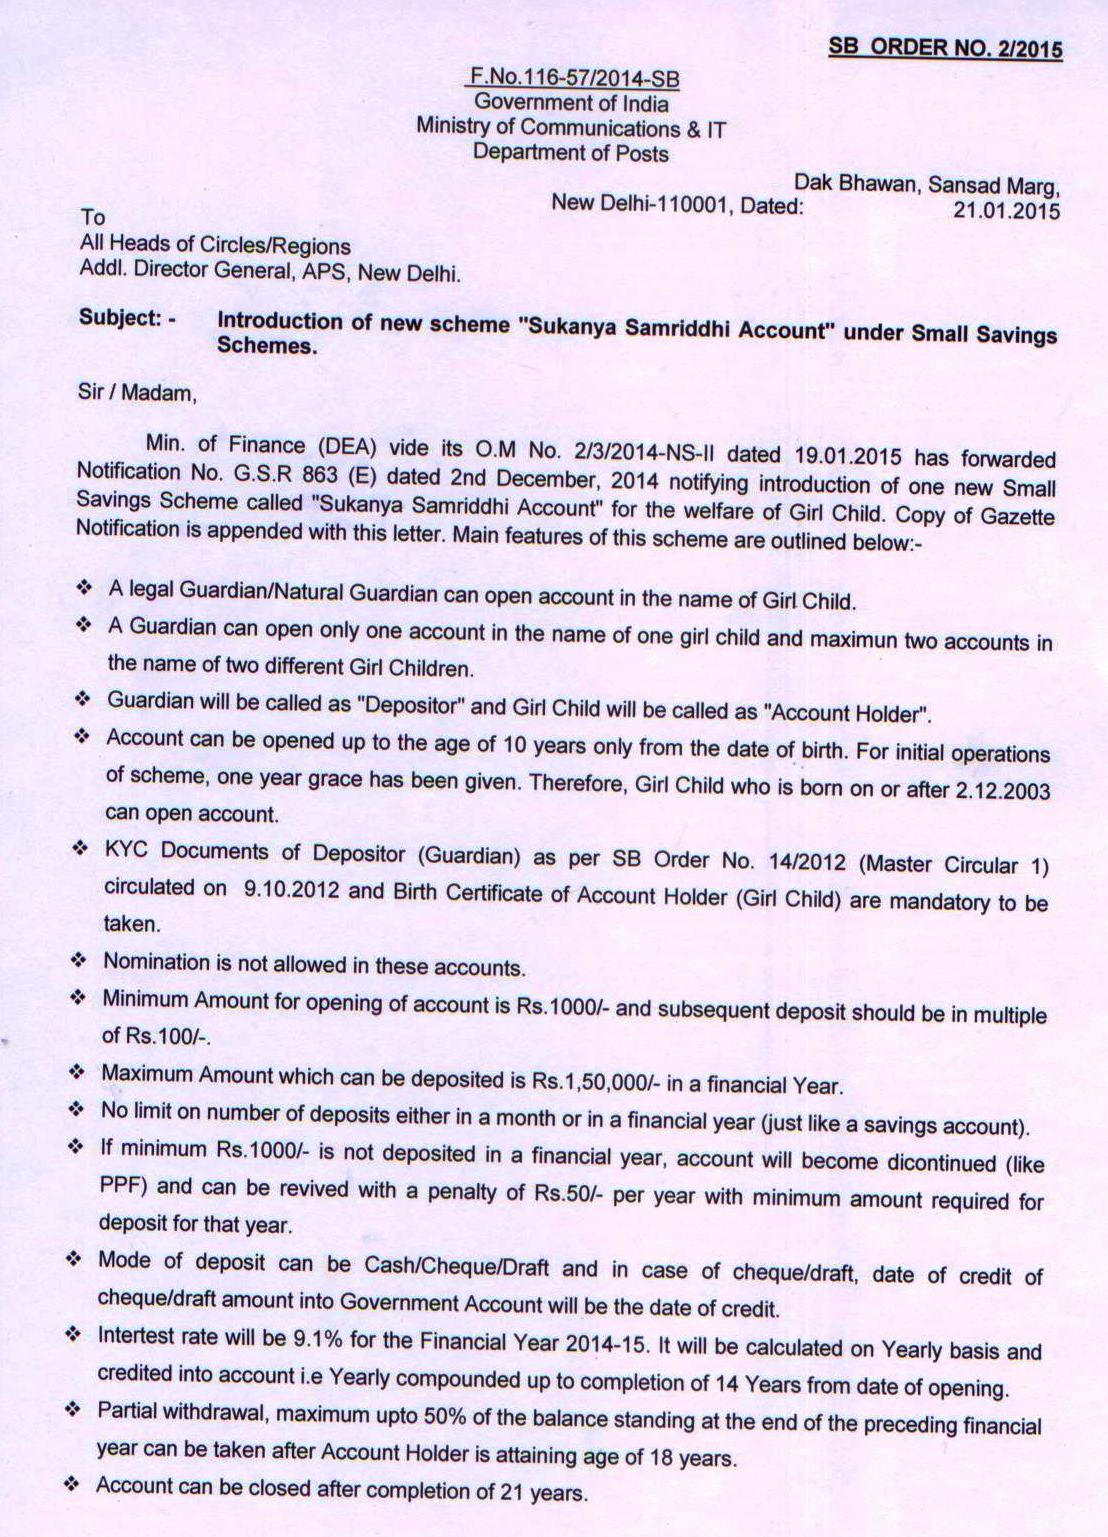 sukanya samriddhi yojana pdf in gujarati